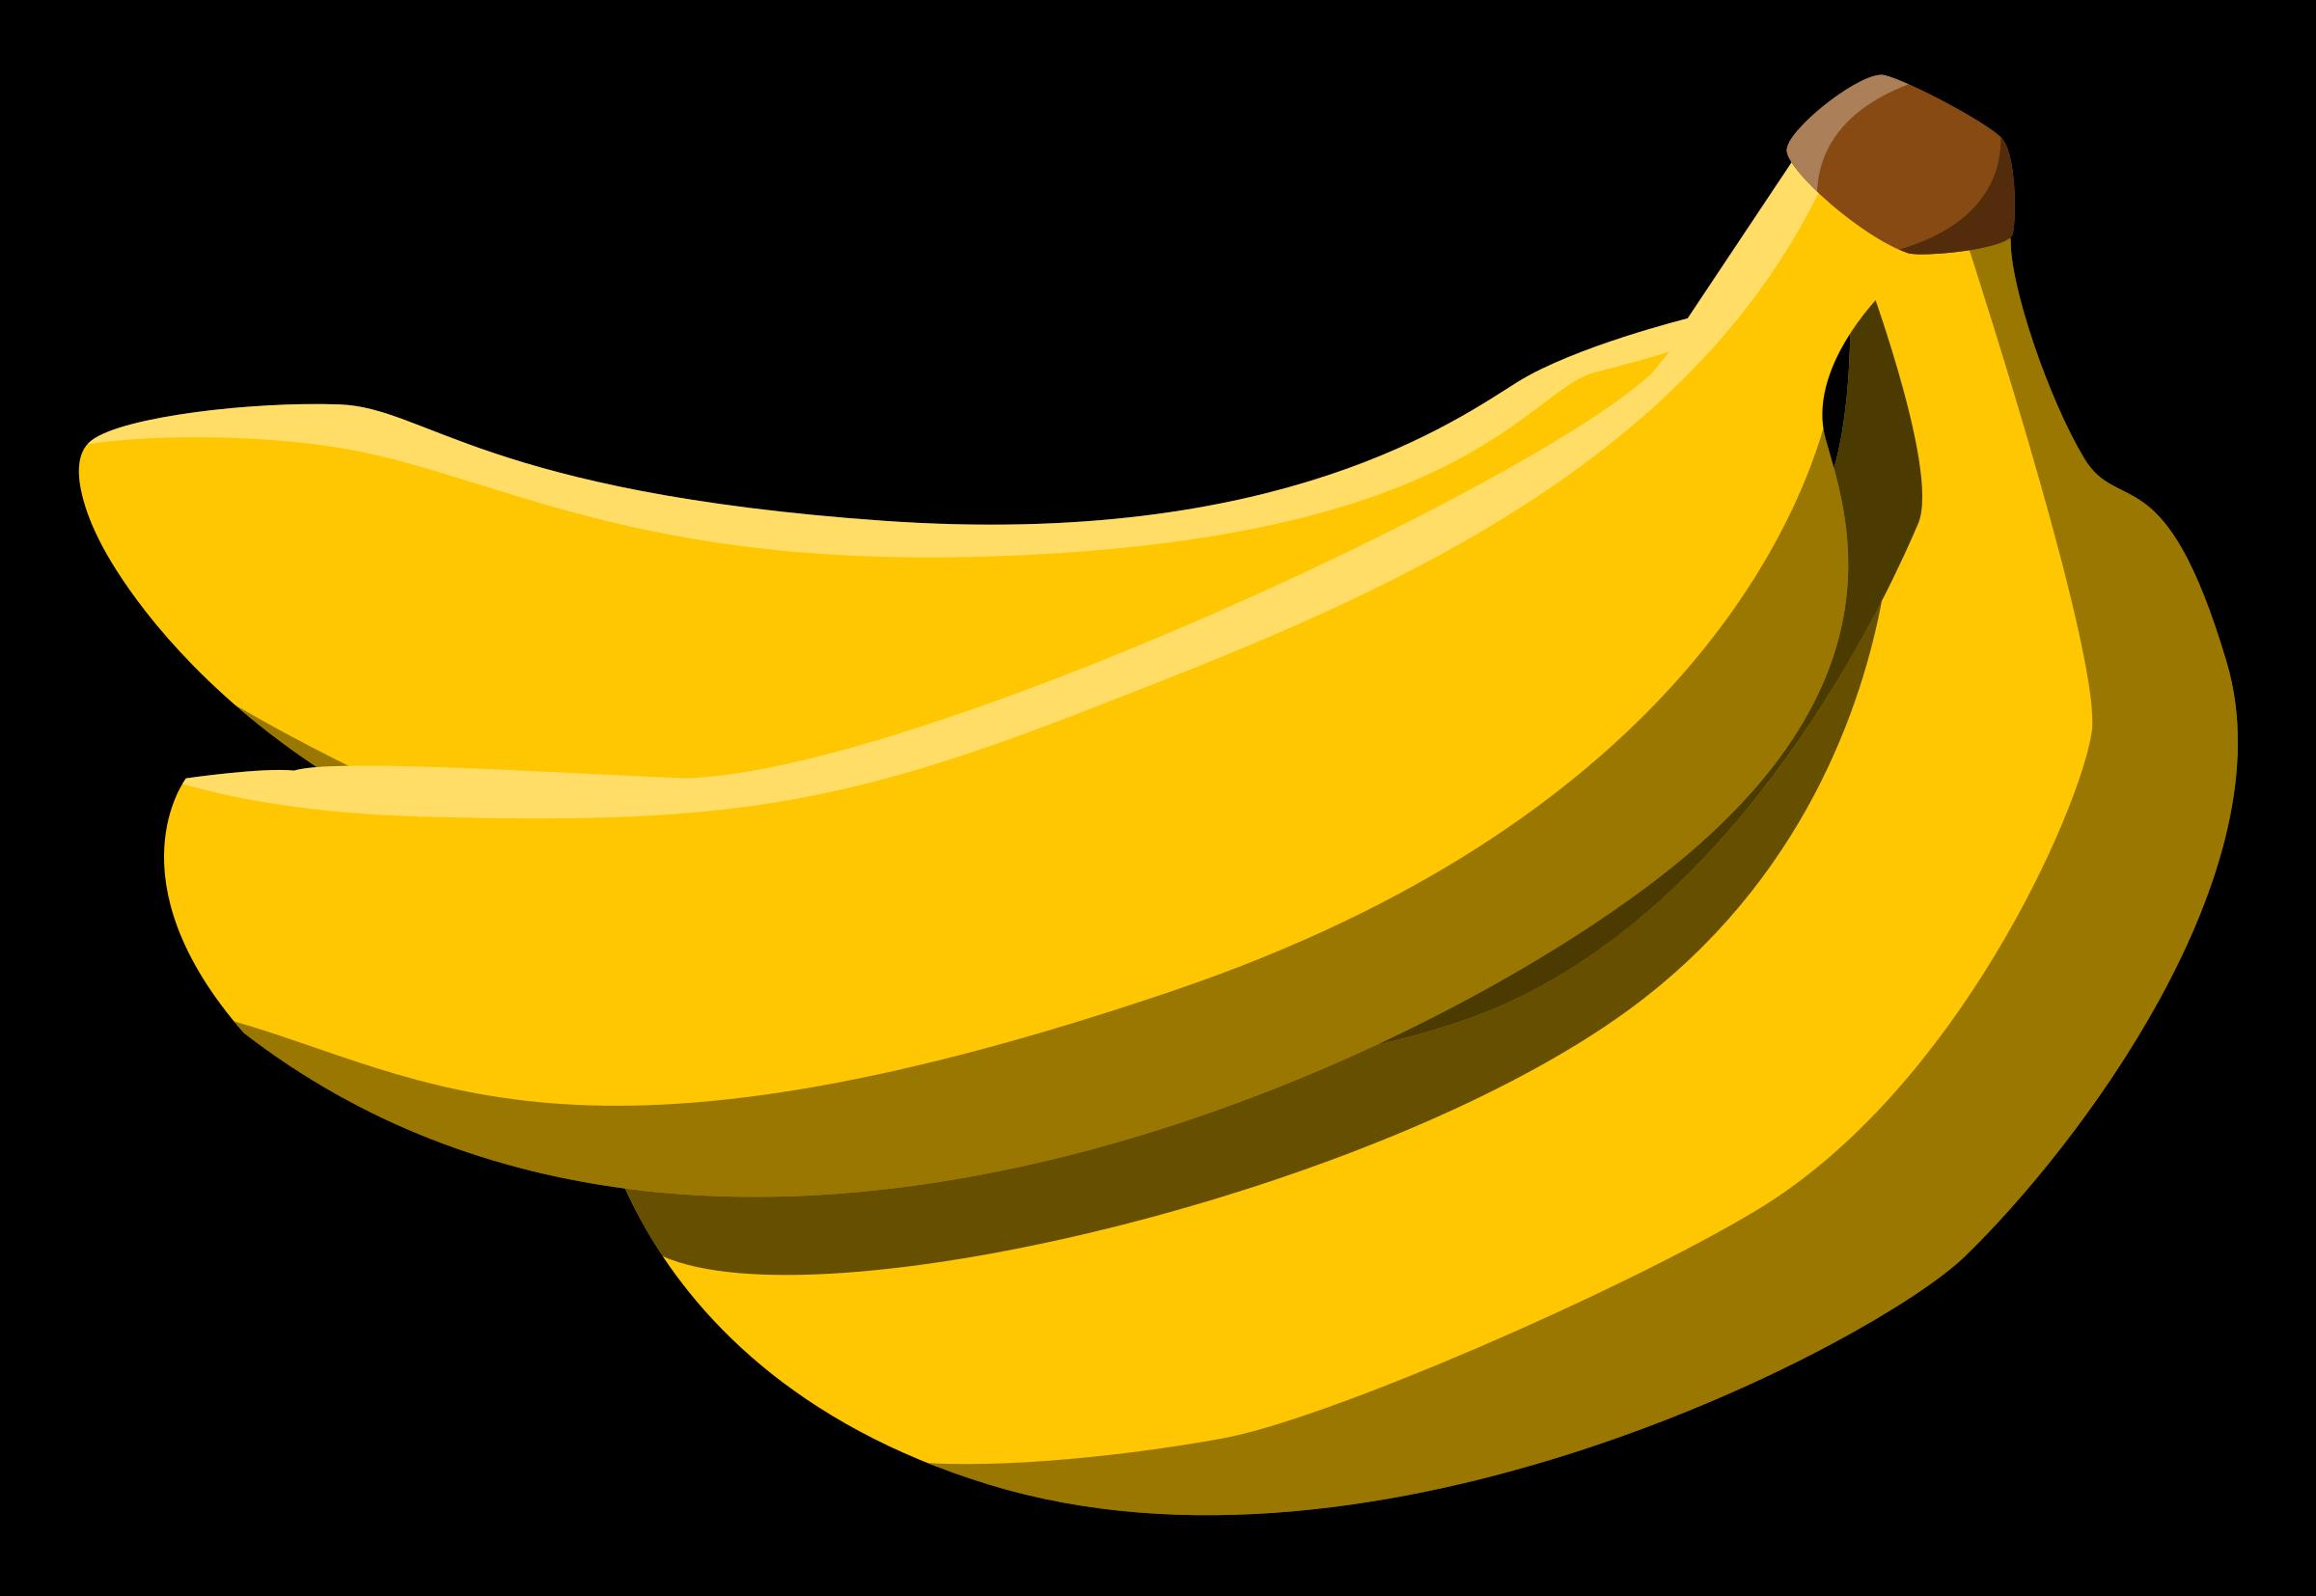 Bananas clipart icon. Big image png